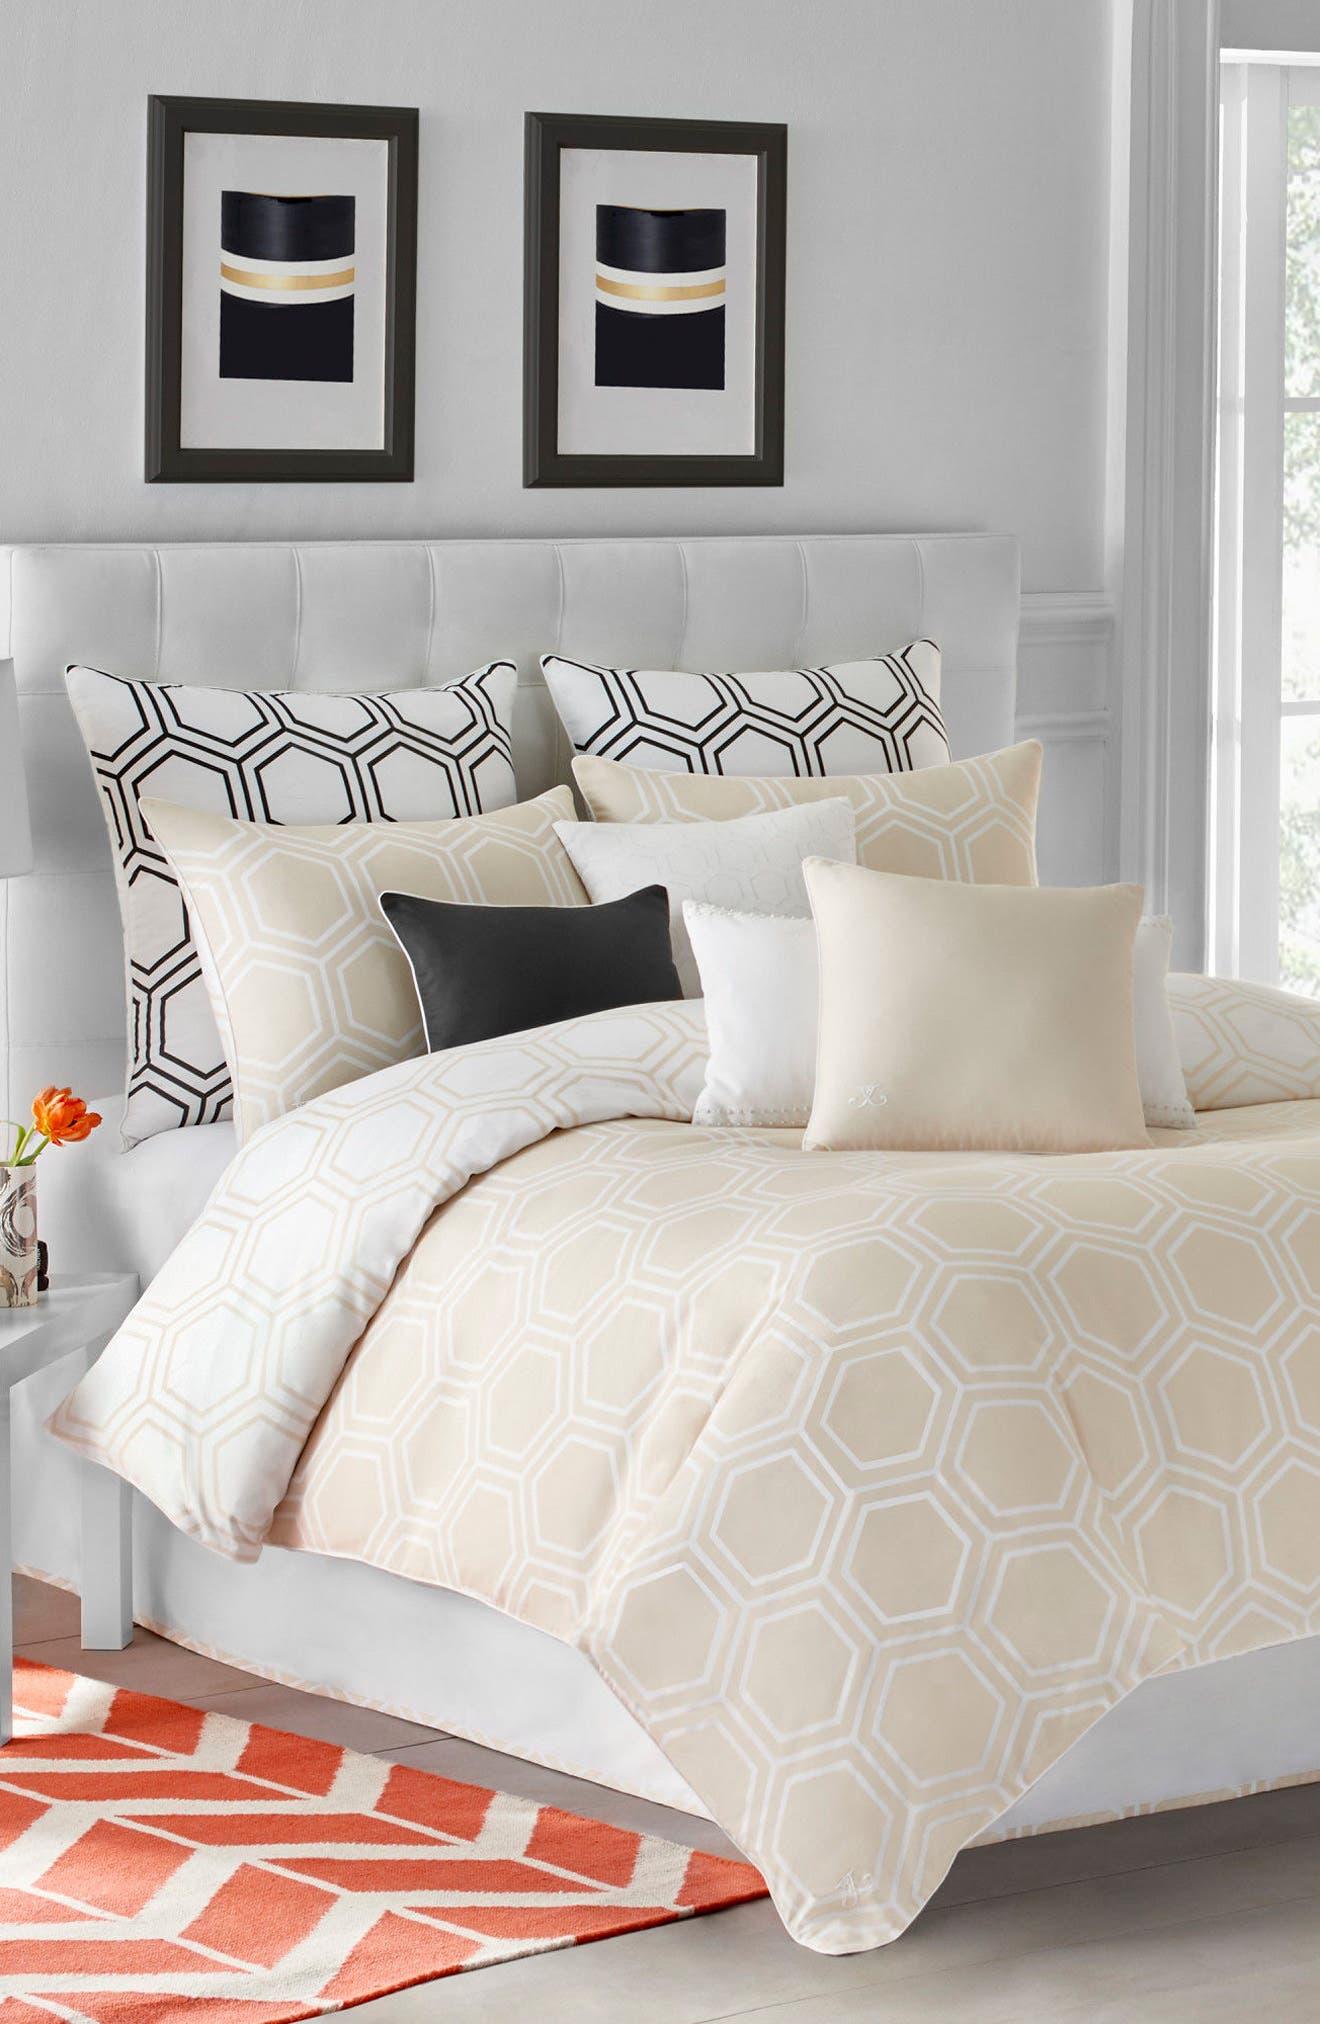 Jill Rosenwald Blackpoint Hex Comforter & Shams